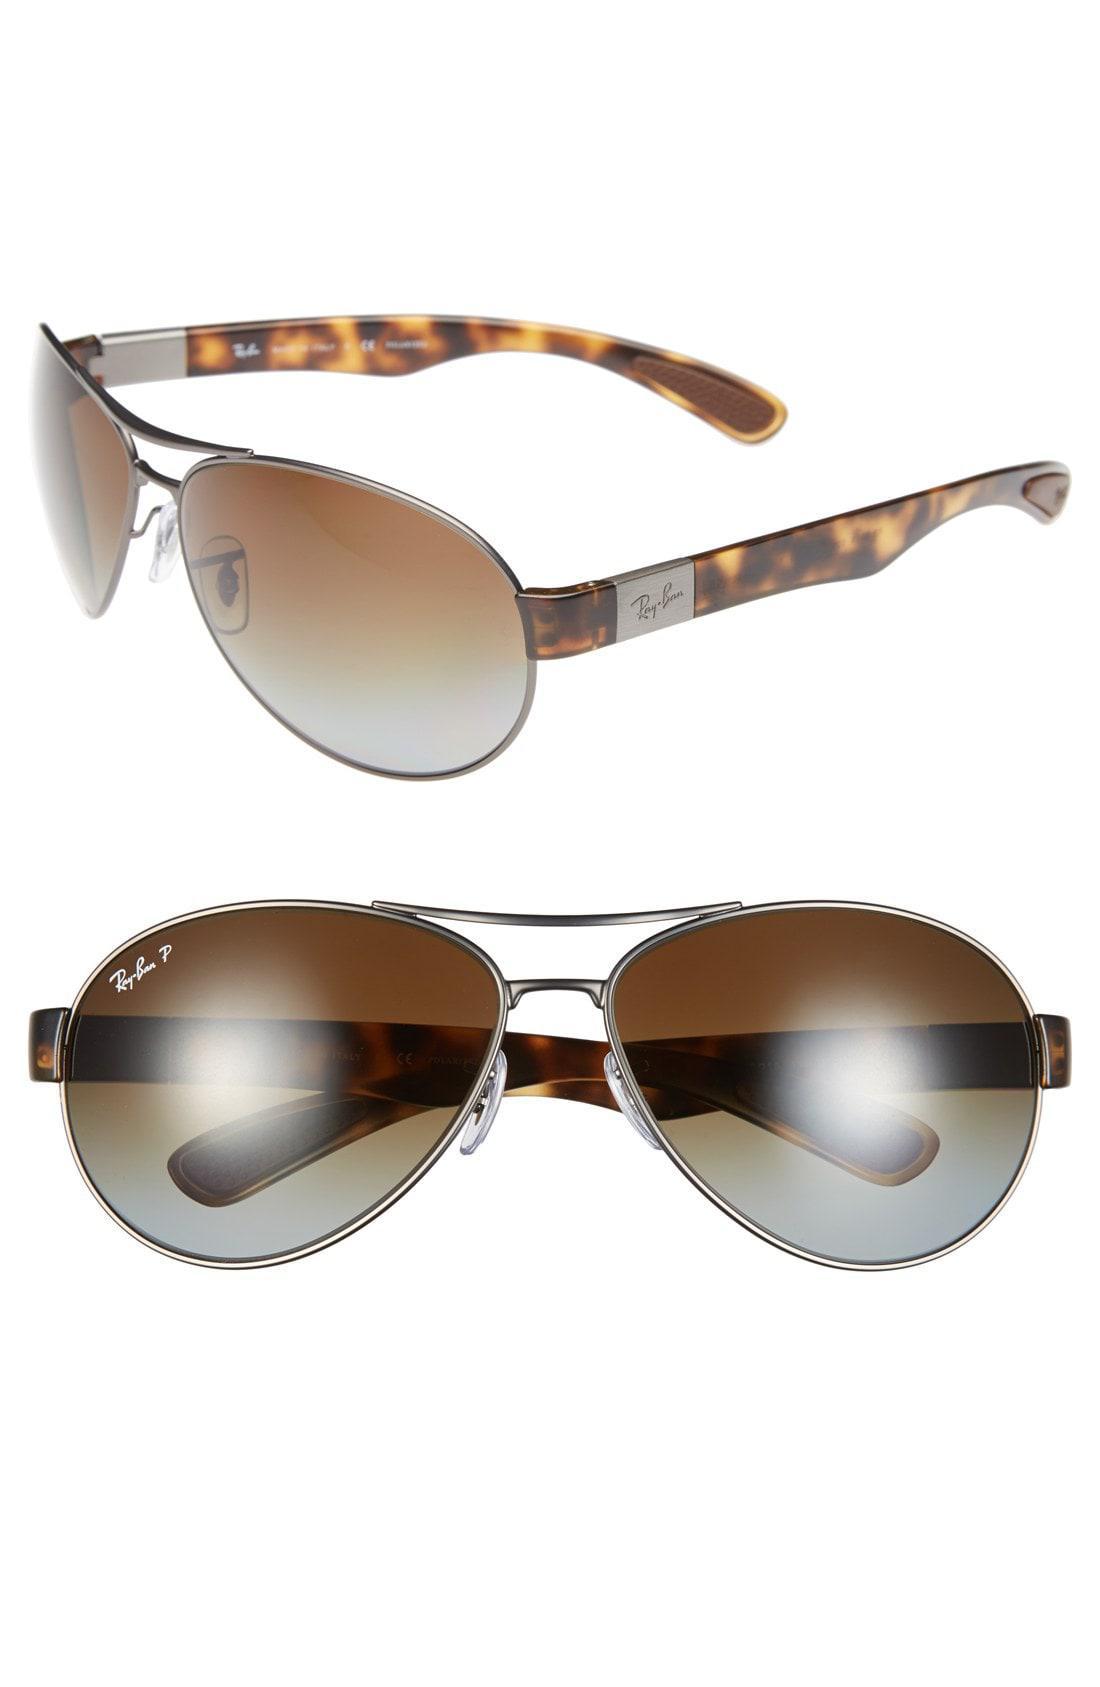 6862ff2259b Lyst - Ray-Ban 66mm Aviator Sunglasses - Gunmetal  Brown Gradient in ...